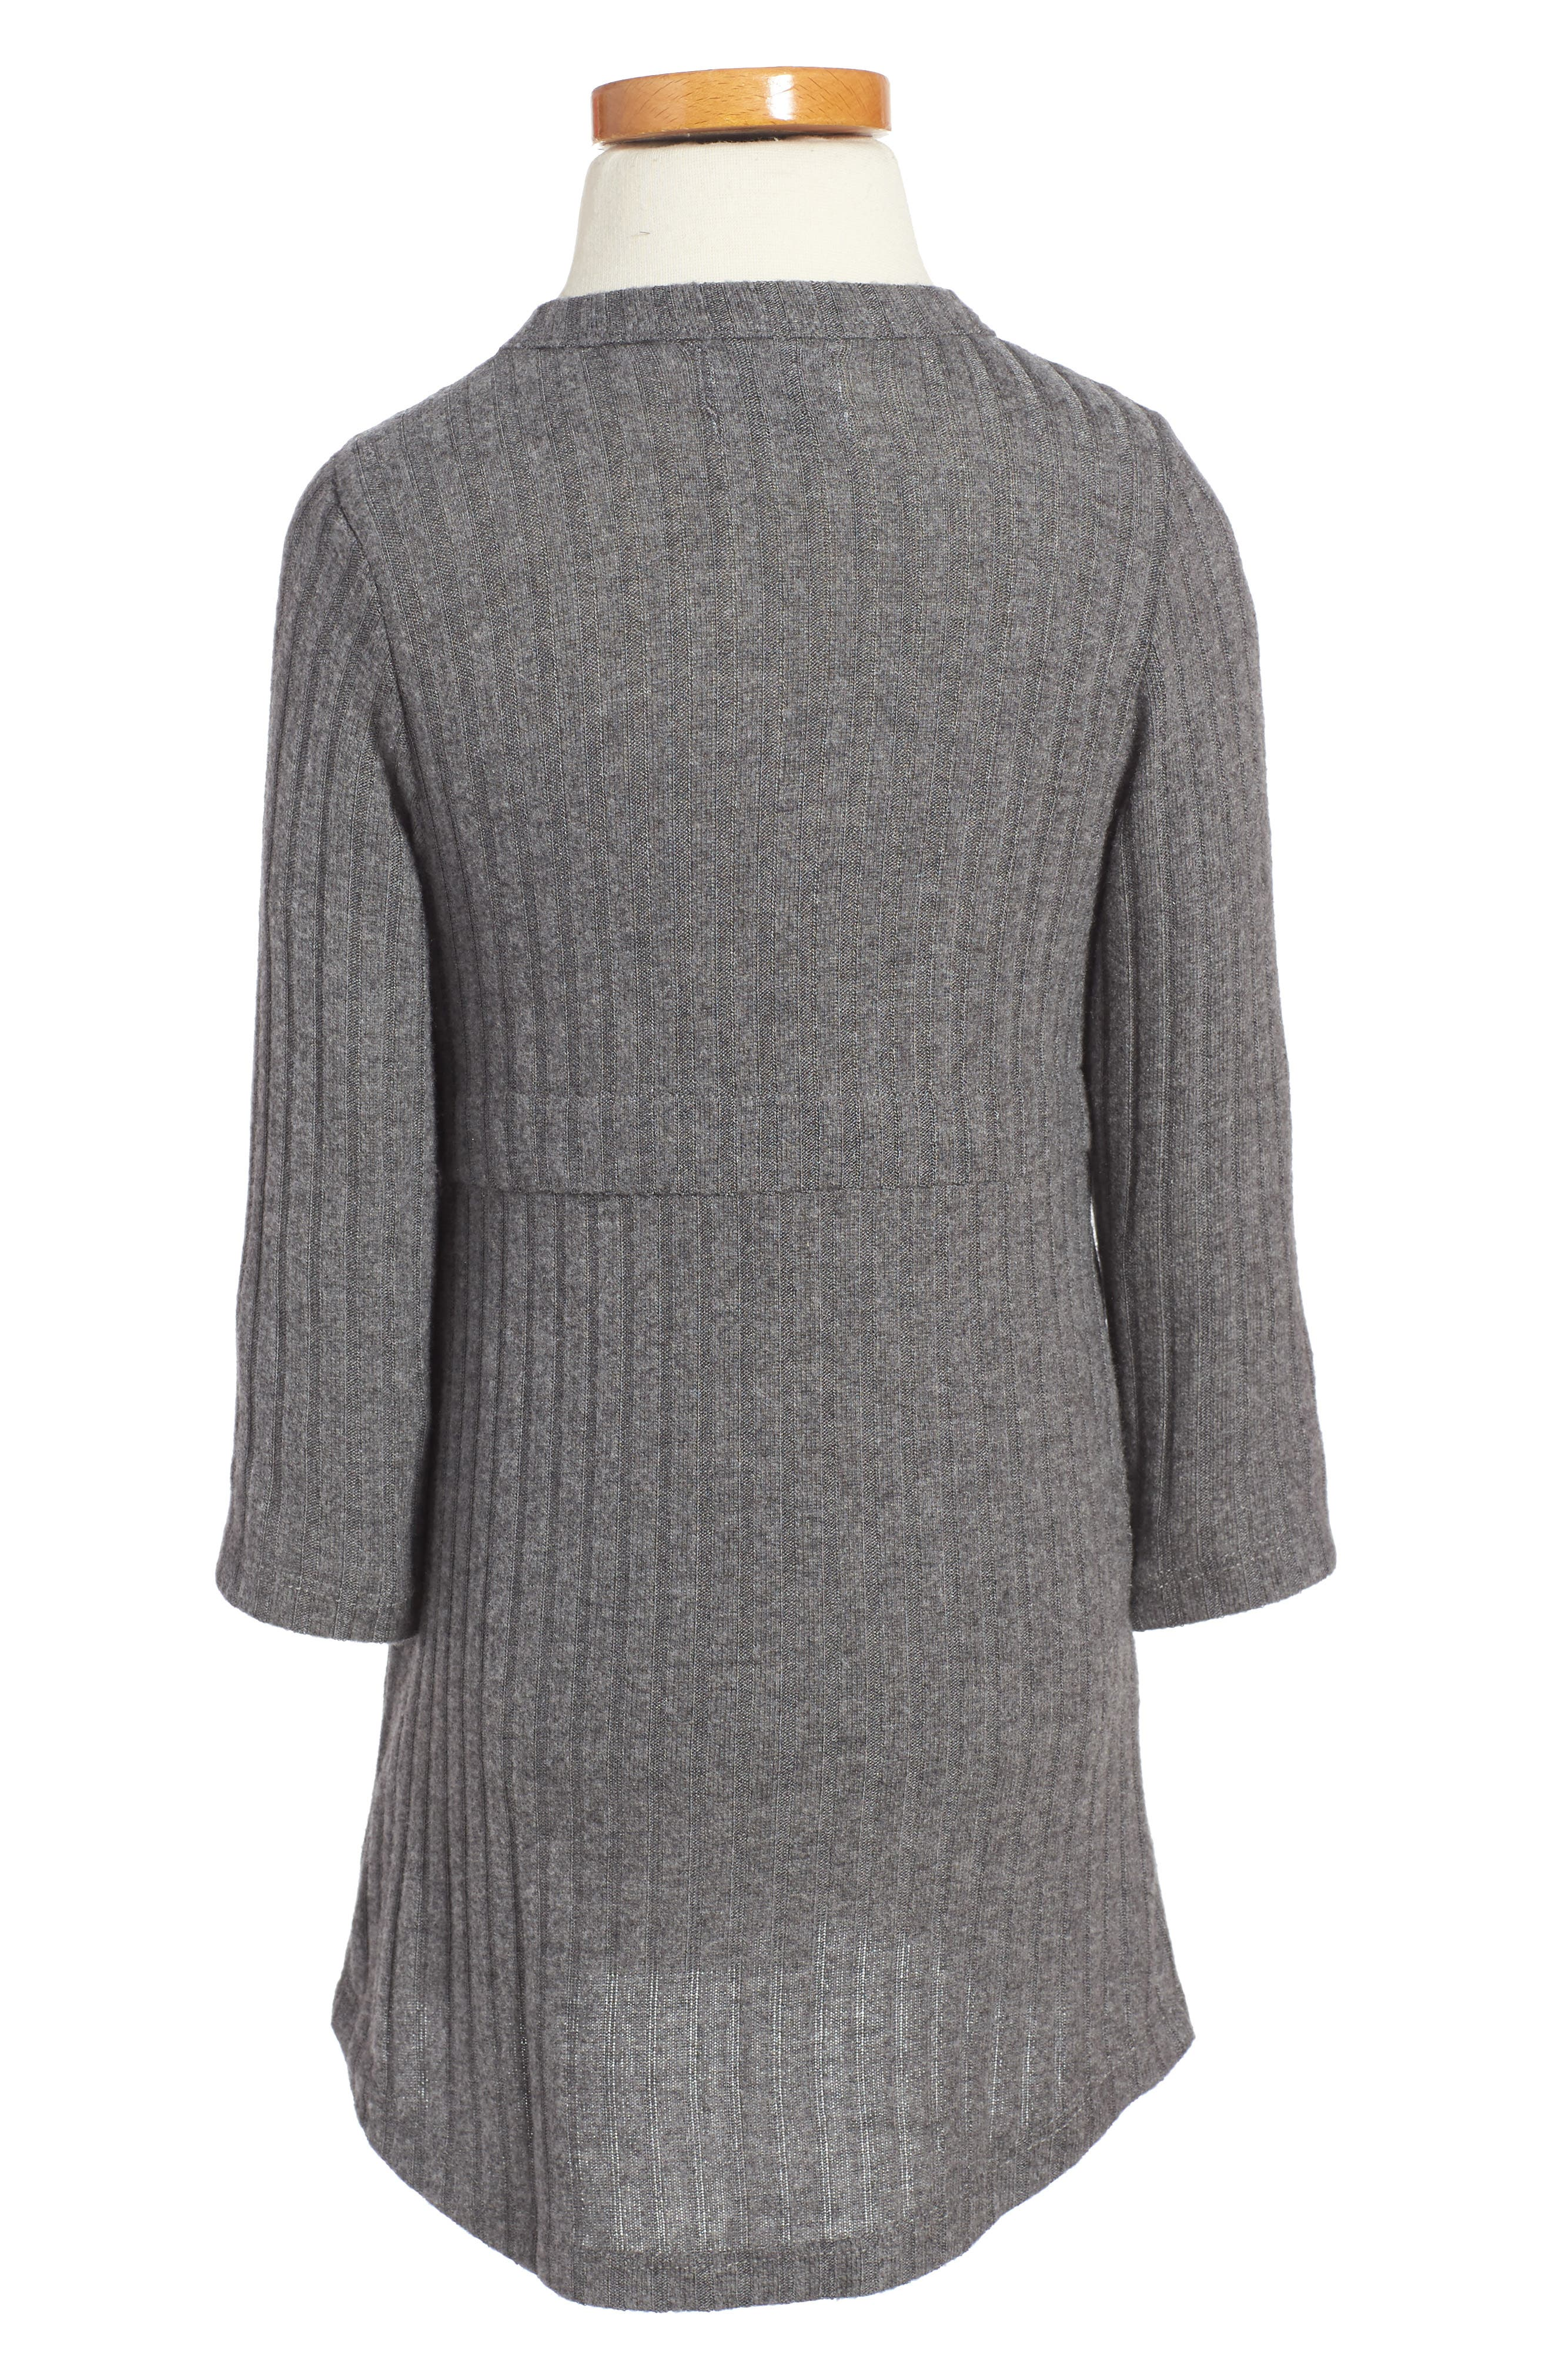 Ellana Ribbed Sweater Dress,                             Alternate thumbnail 2, color,                             Charcoal Rib